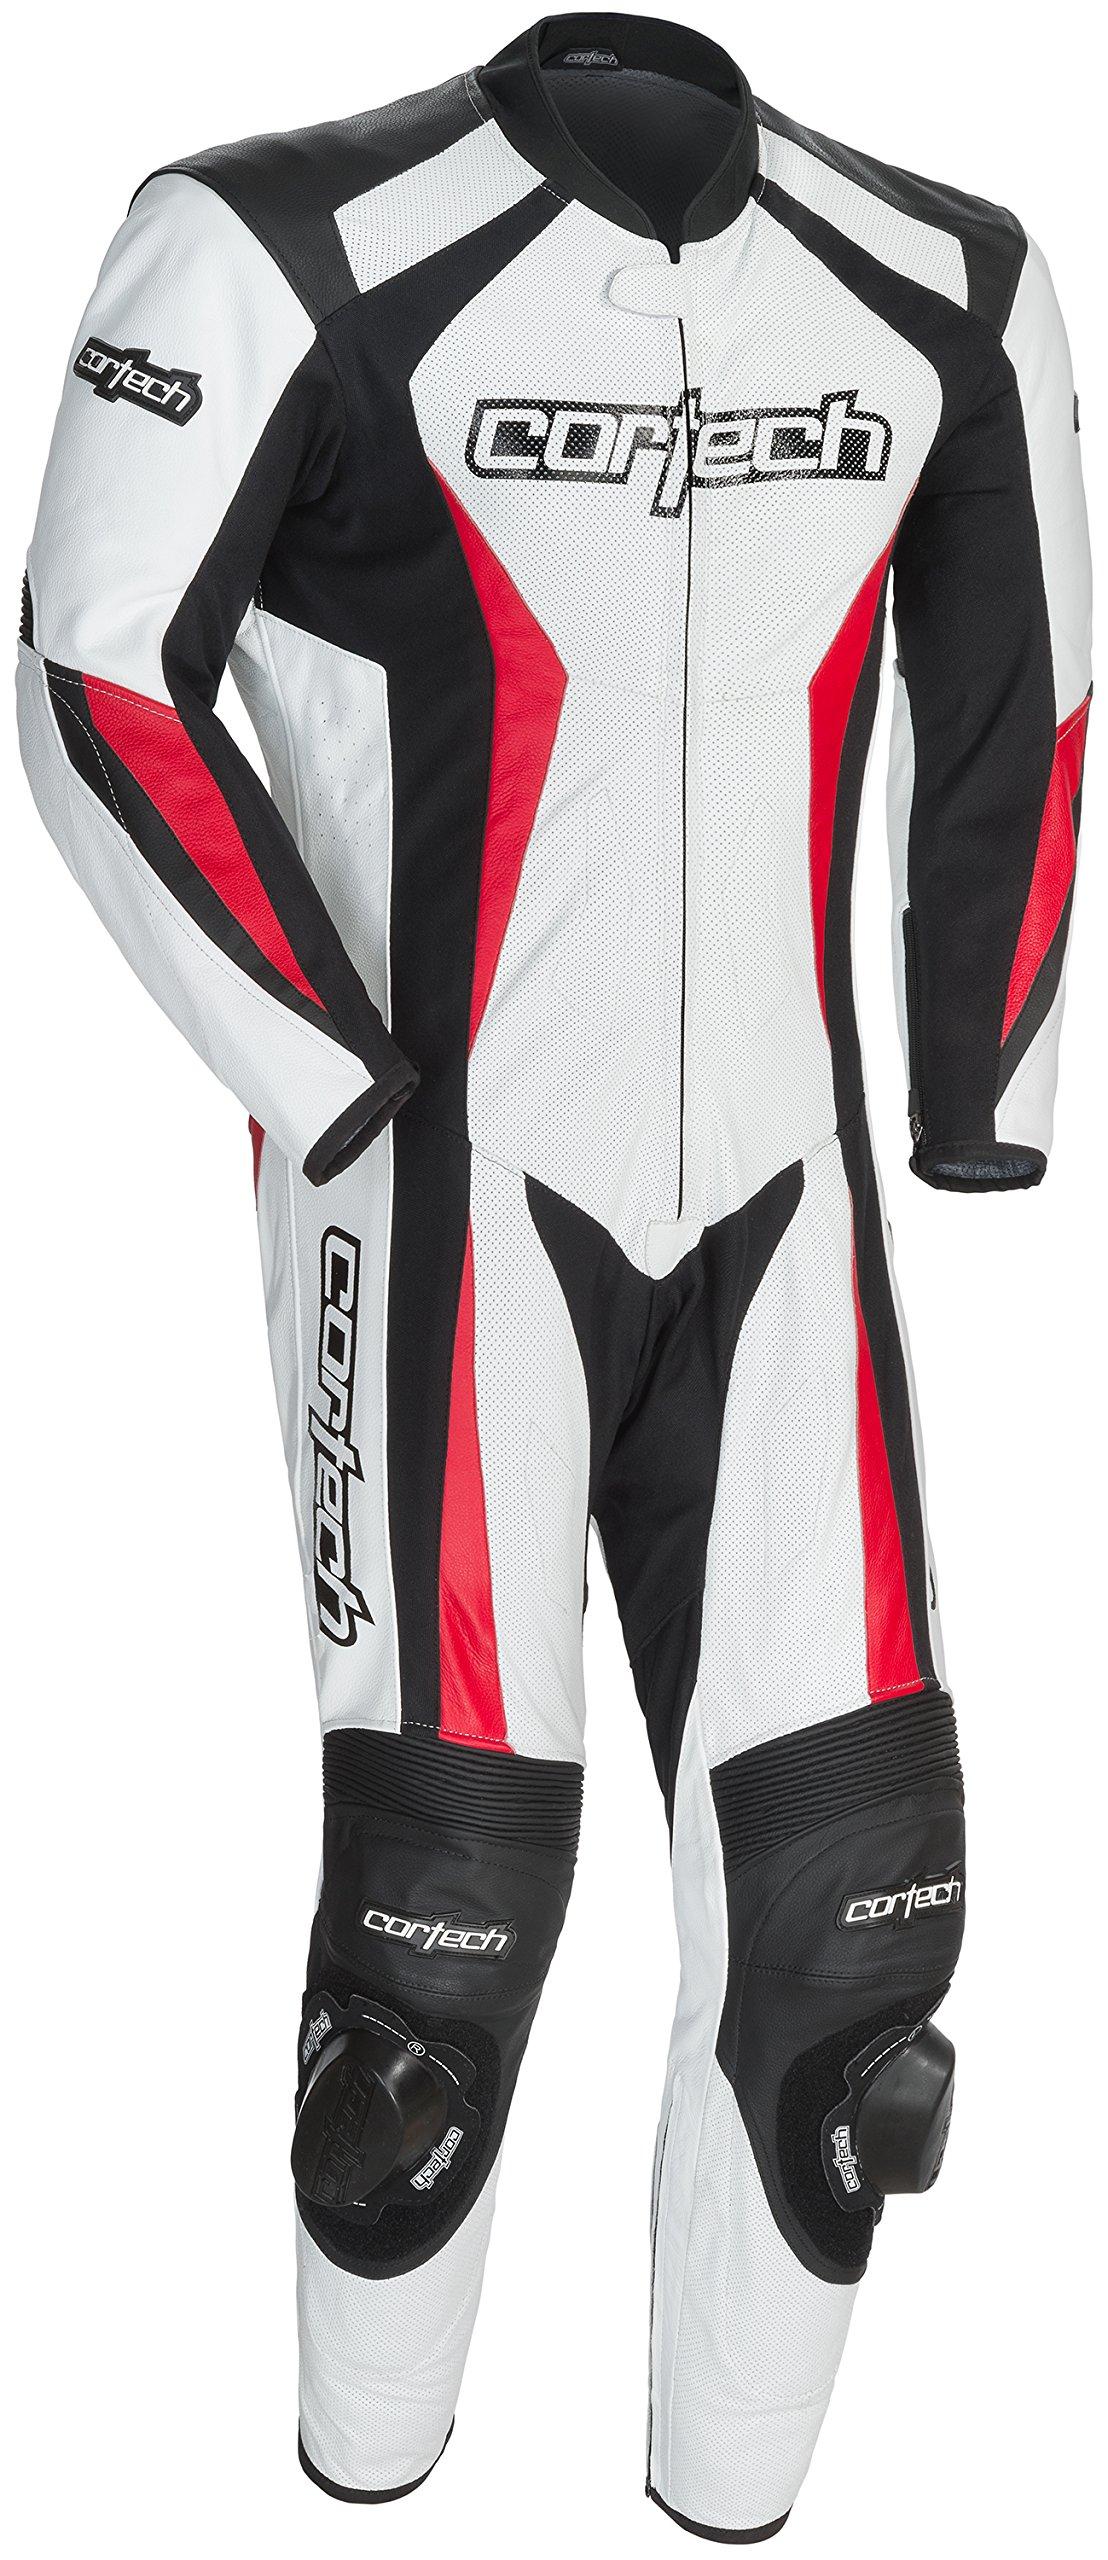 Cortech XF-10-8991-0209-08 Latigo 2.0 Leather RR One-Piece Suit, Distinct Name: White/Black/Red, Gender: Mens/Unisex, Primary Color: White, Size: 2XL